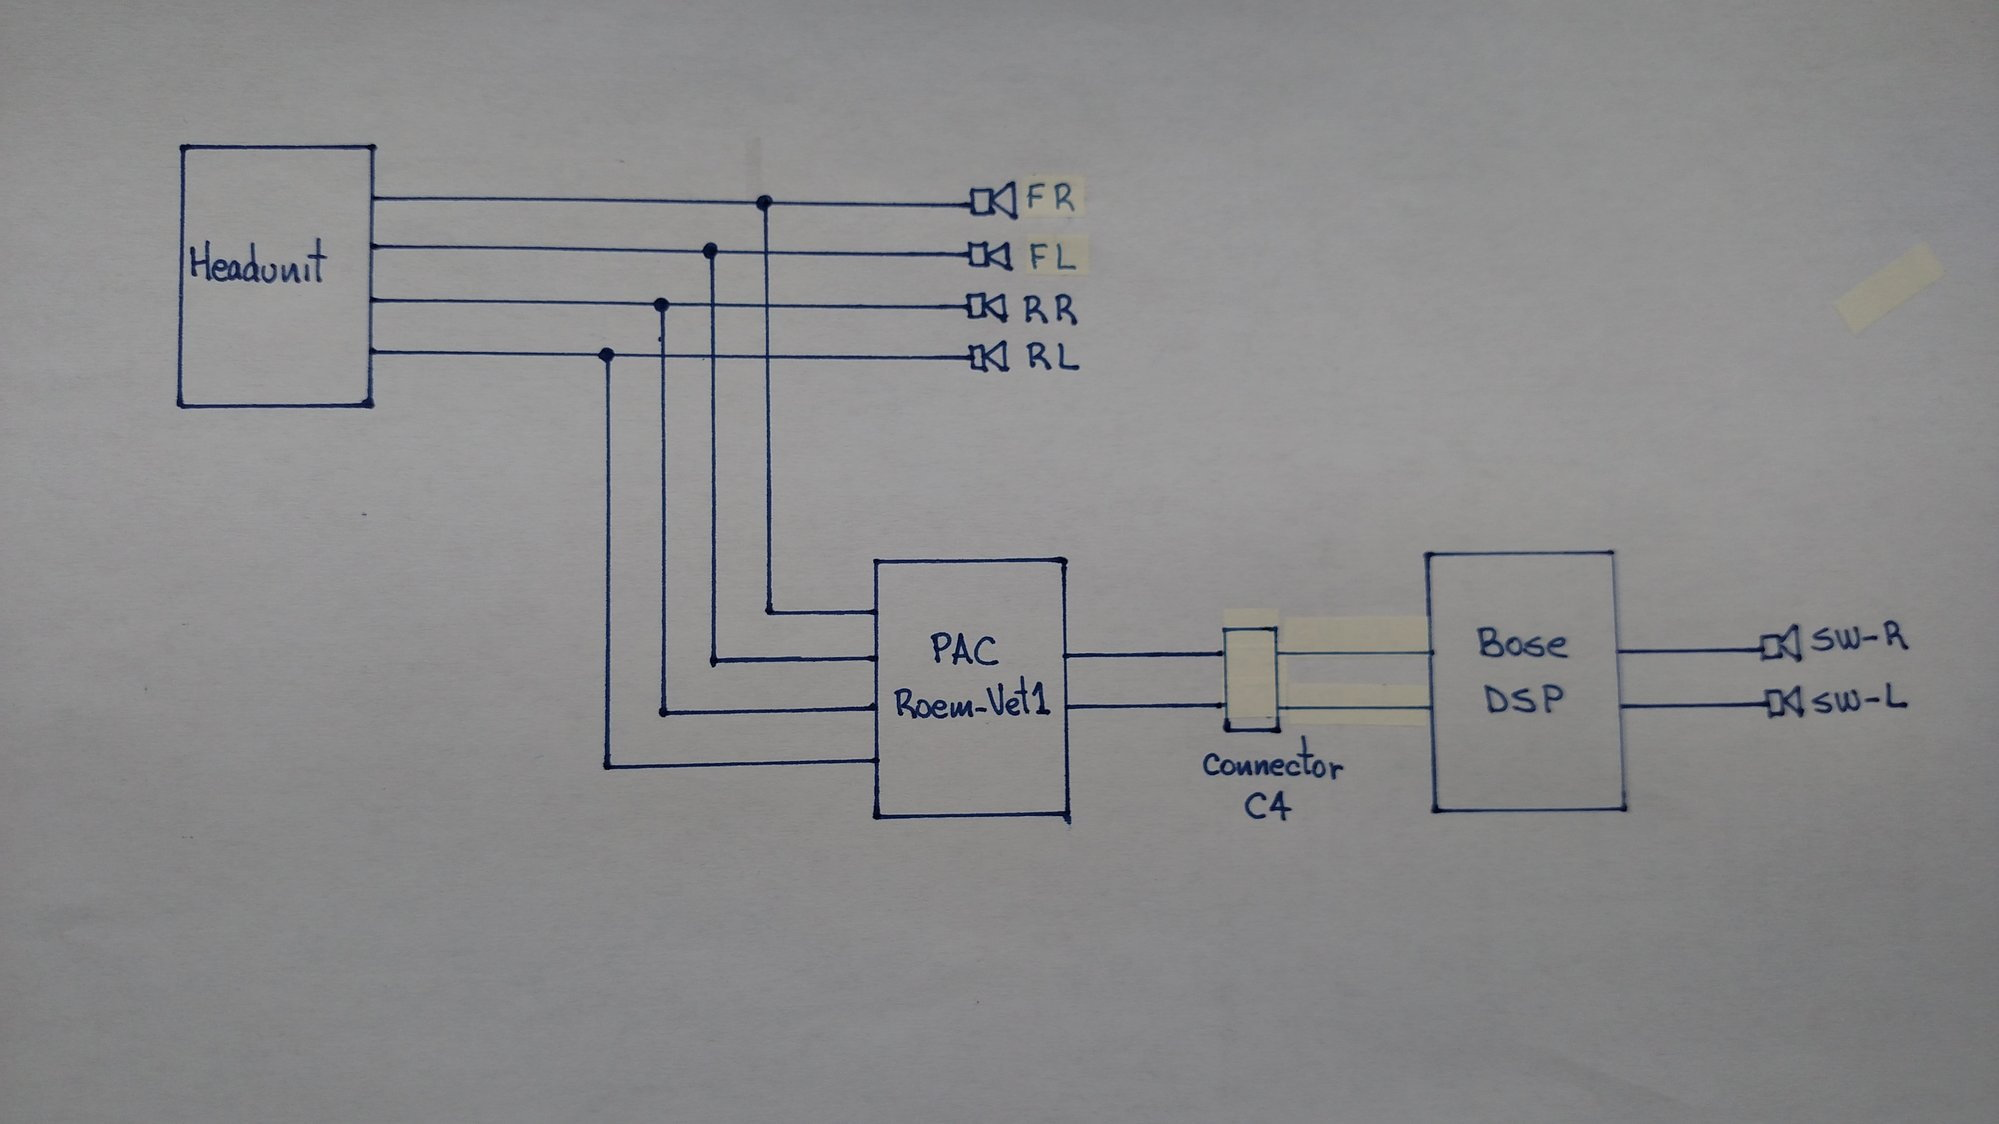 Upgrading Head Unit-run new speaker wires ? - CorvetteForum